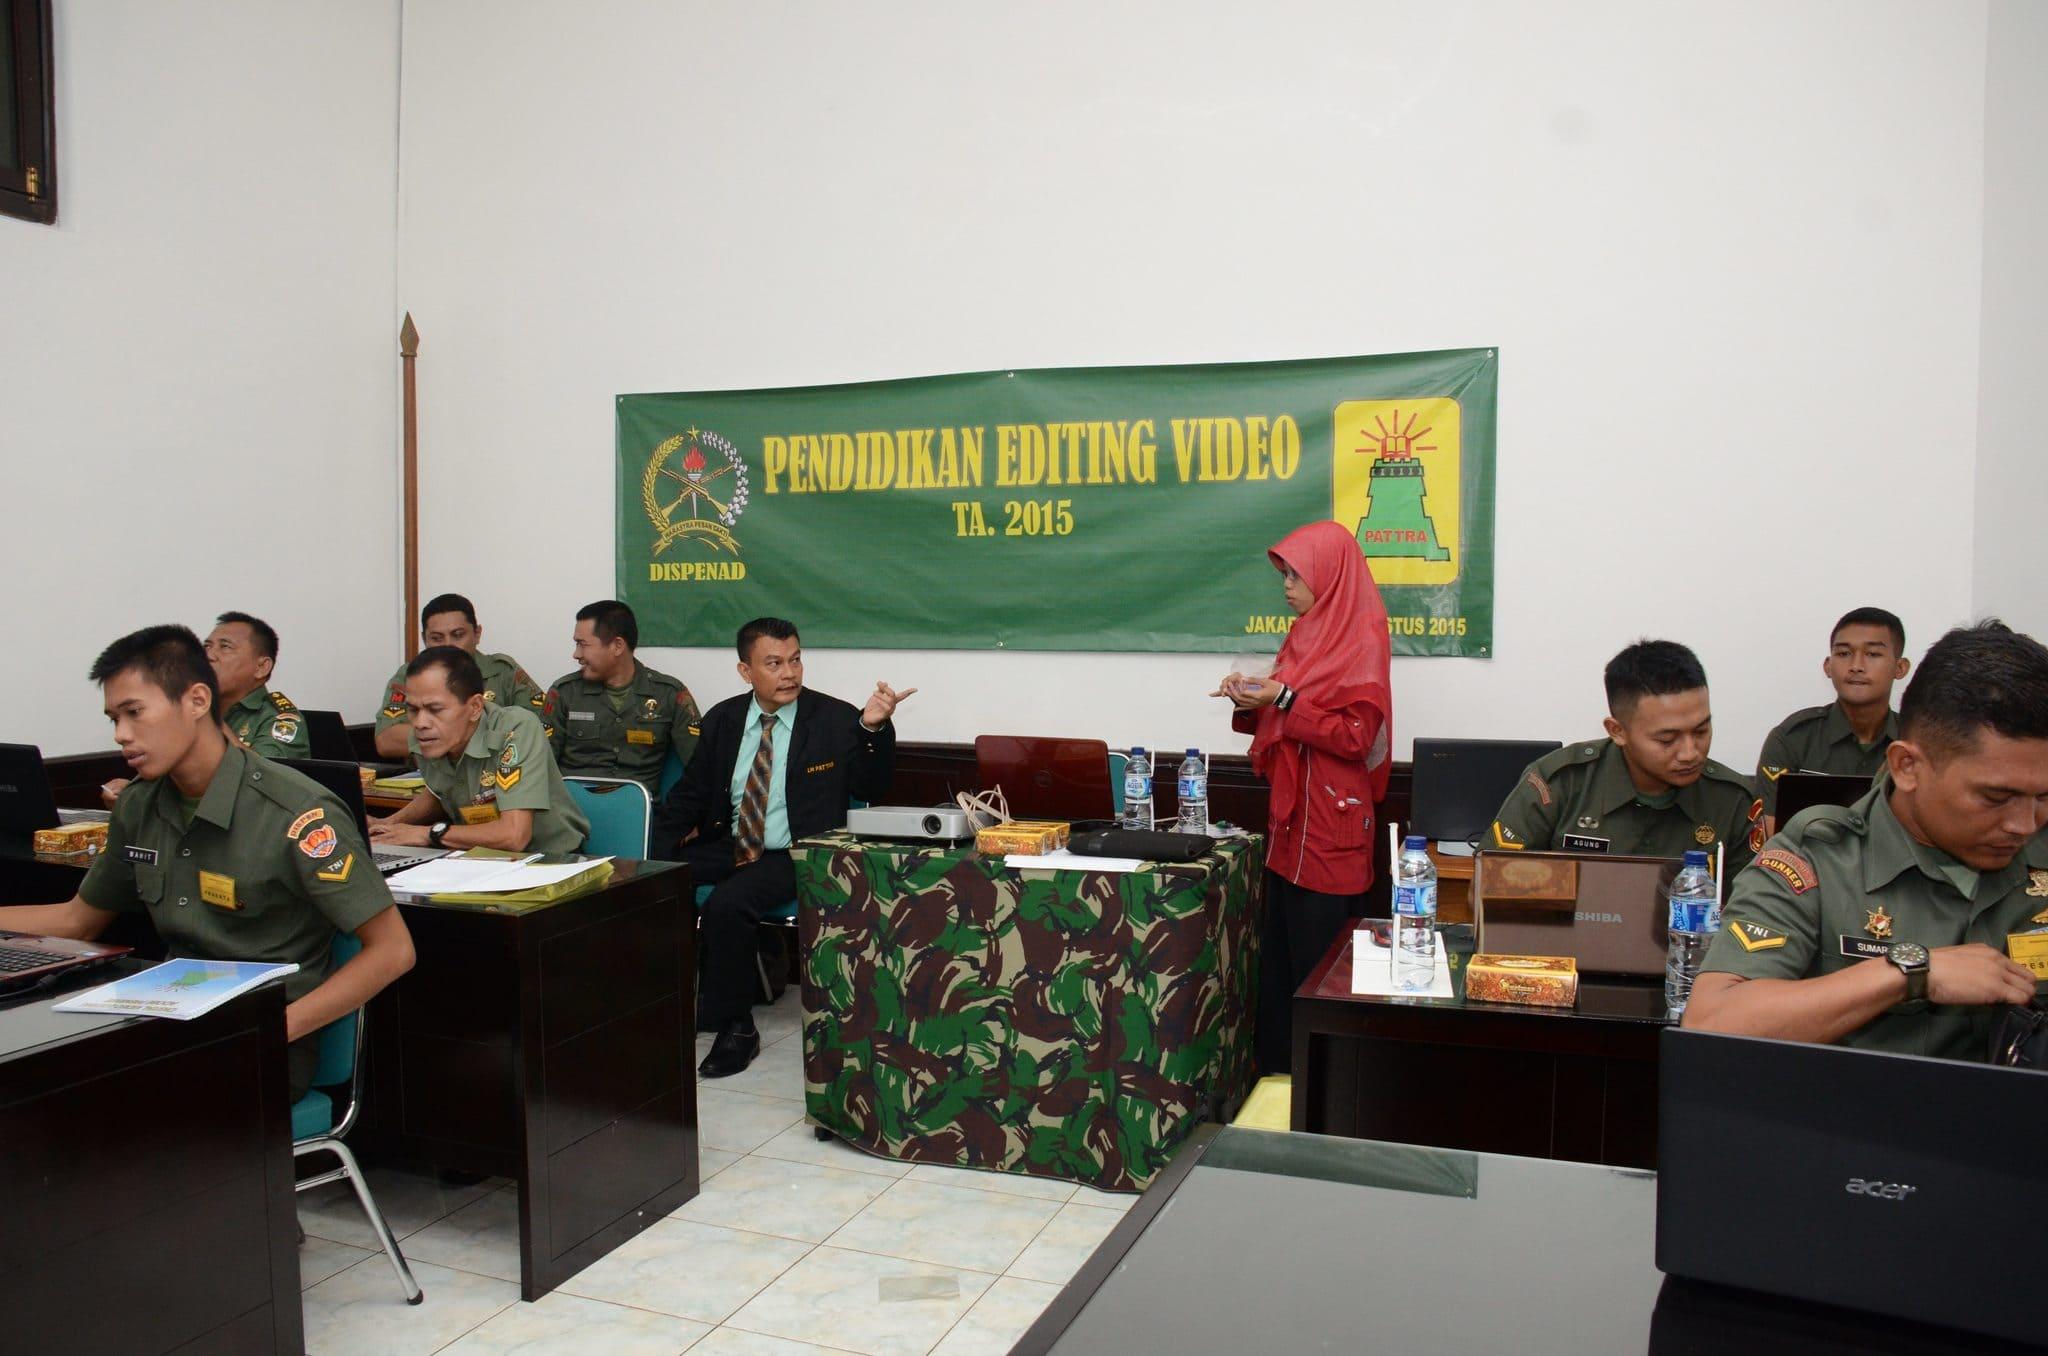 Dispenad Selenggarakan Pendidikan Editing Video